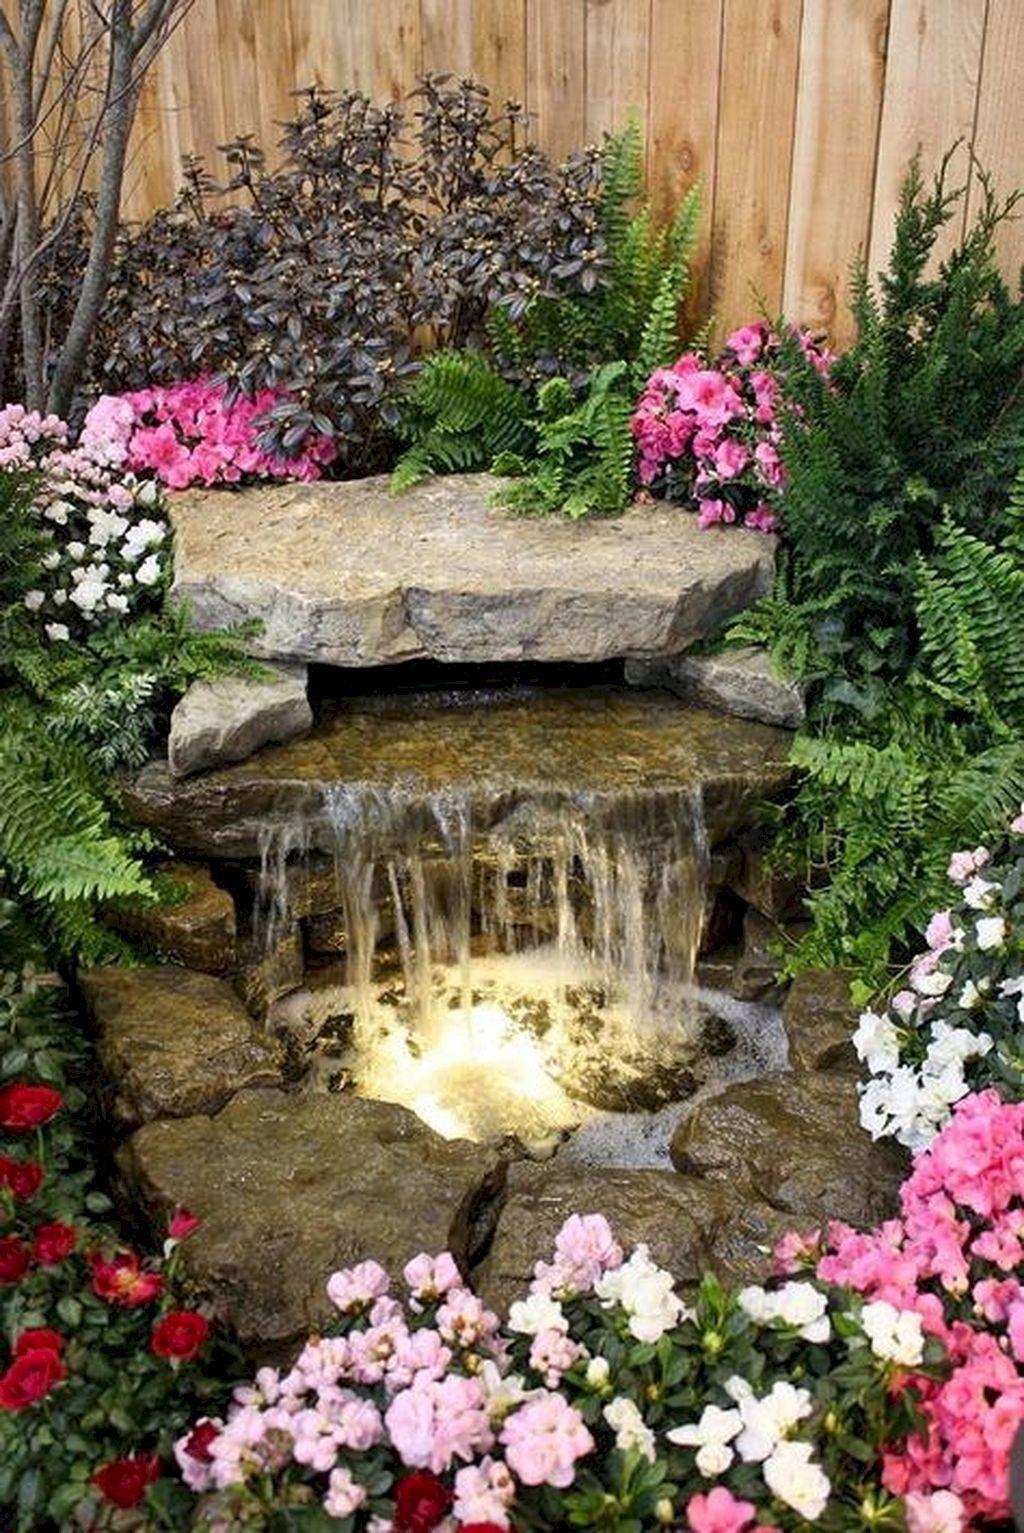 Beautiful Backyard Ponds And Waterfalls Garden Ideas 38 400 x 300